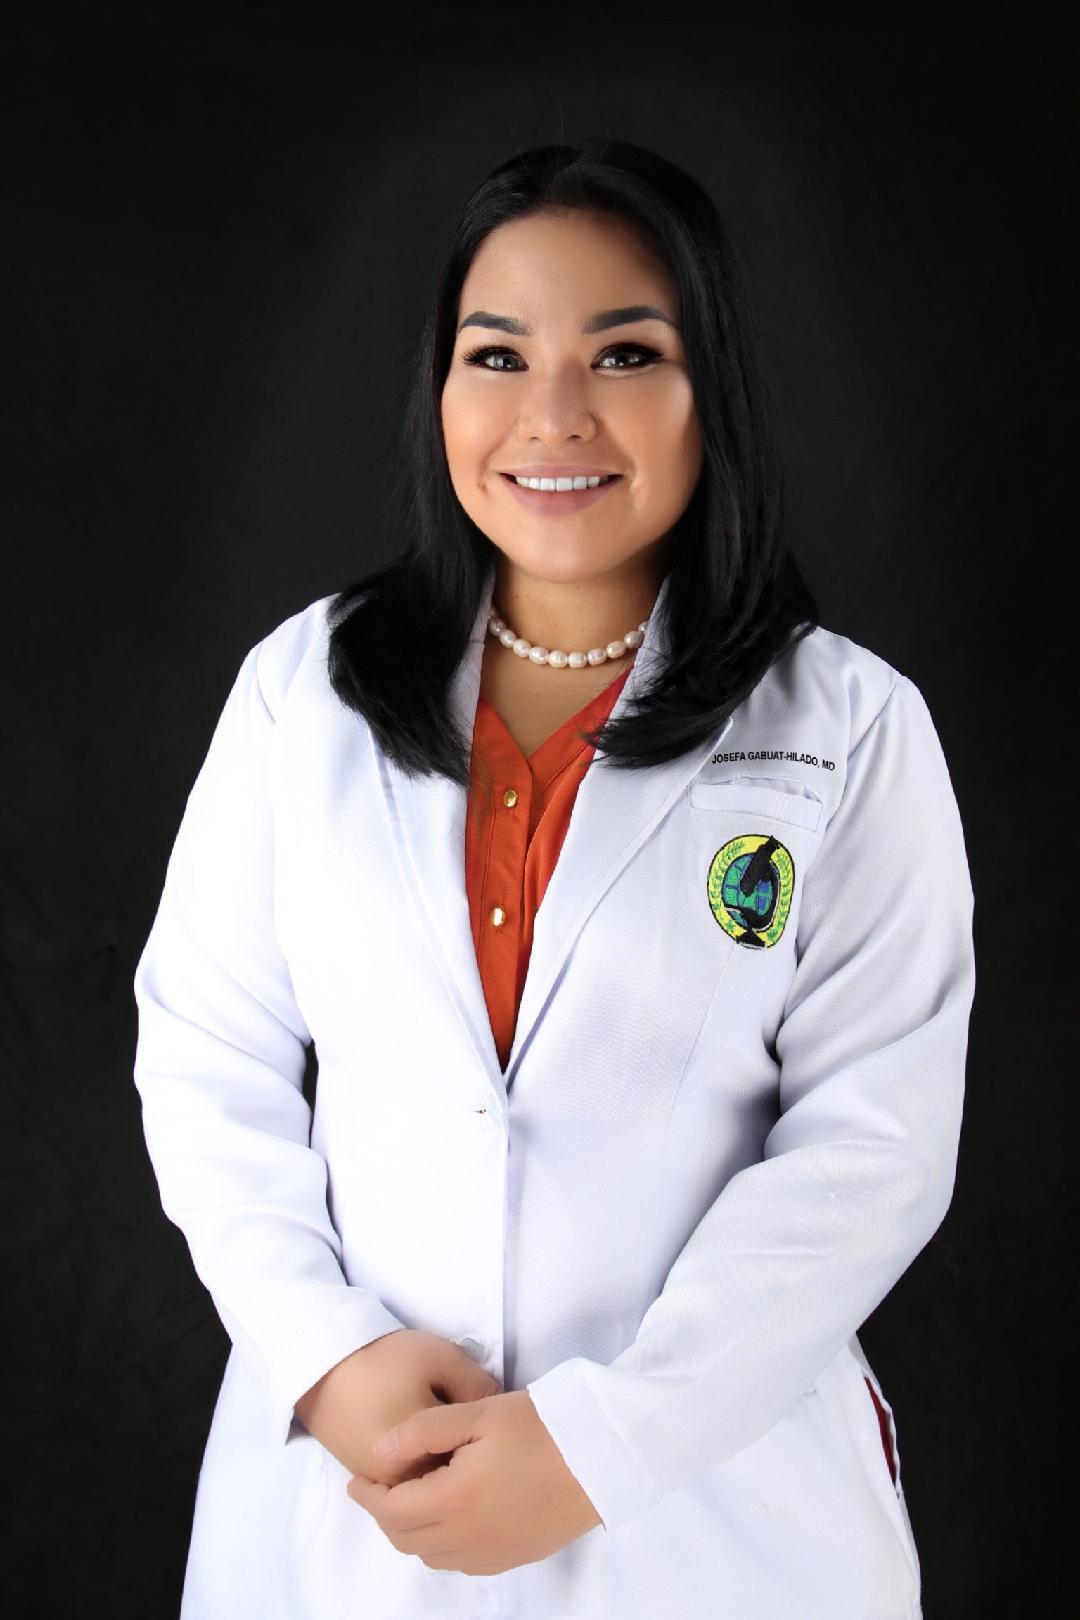 Josefa Gabuat-Hilado, MD, DPSP